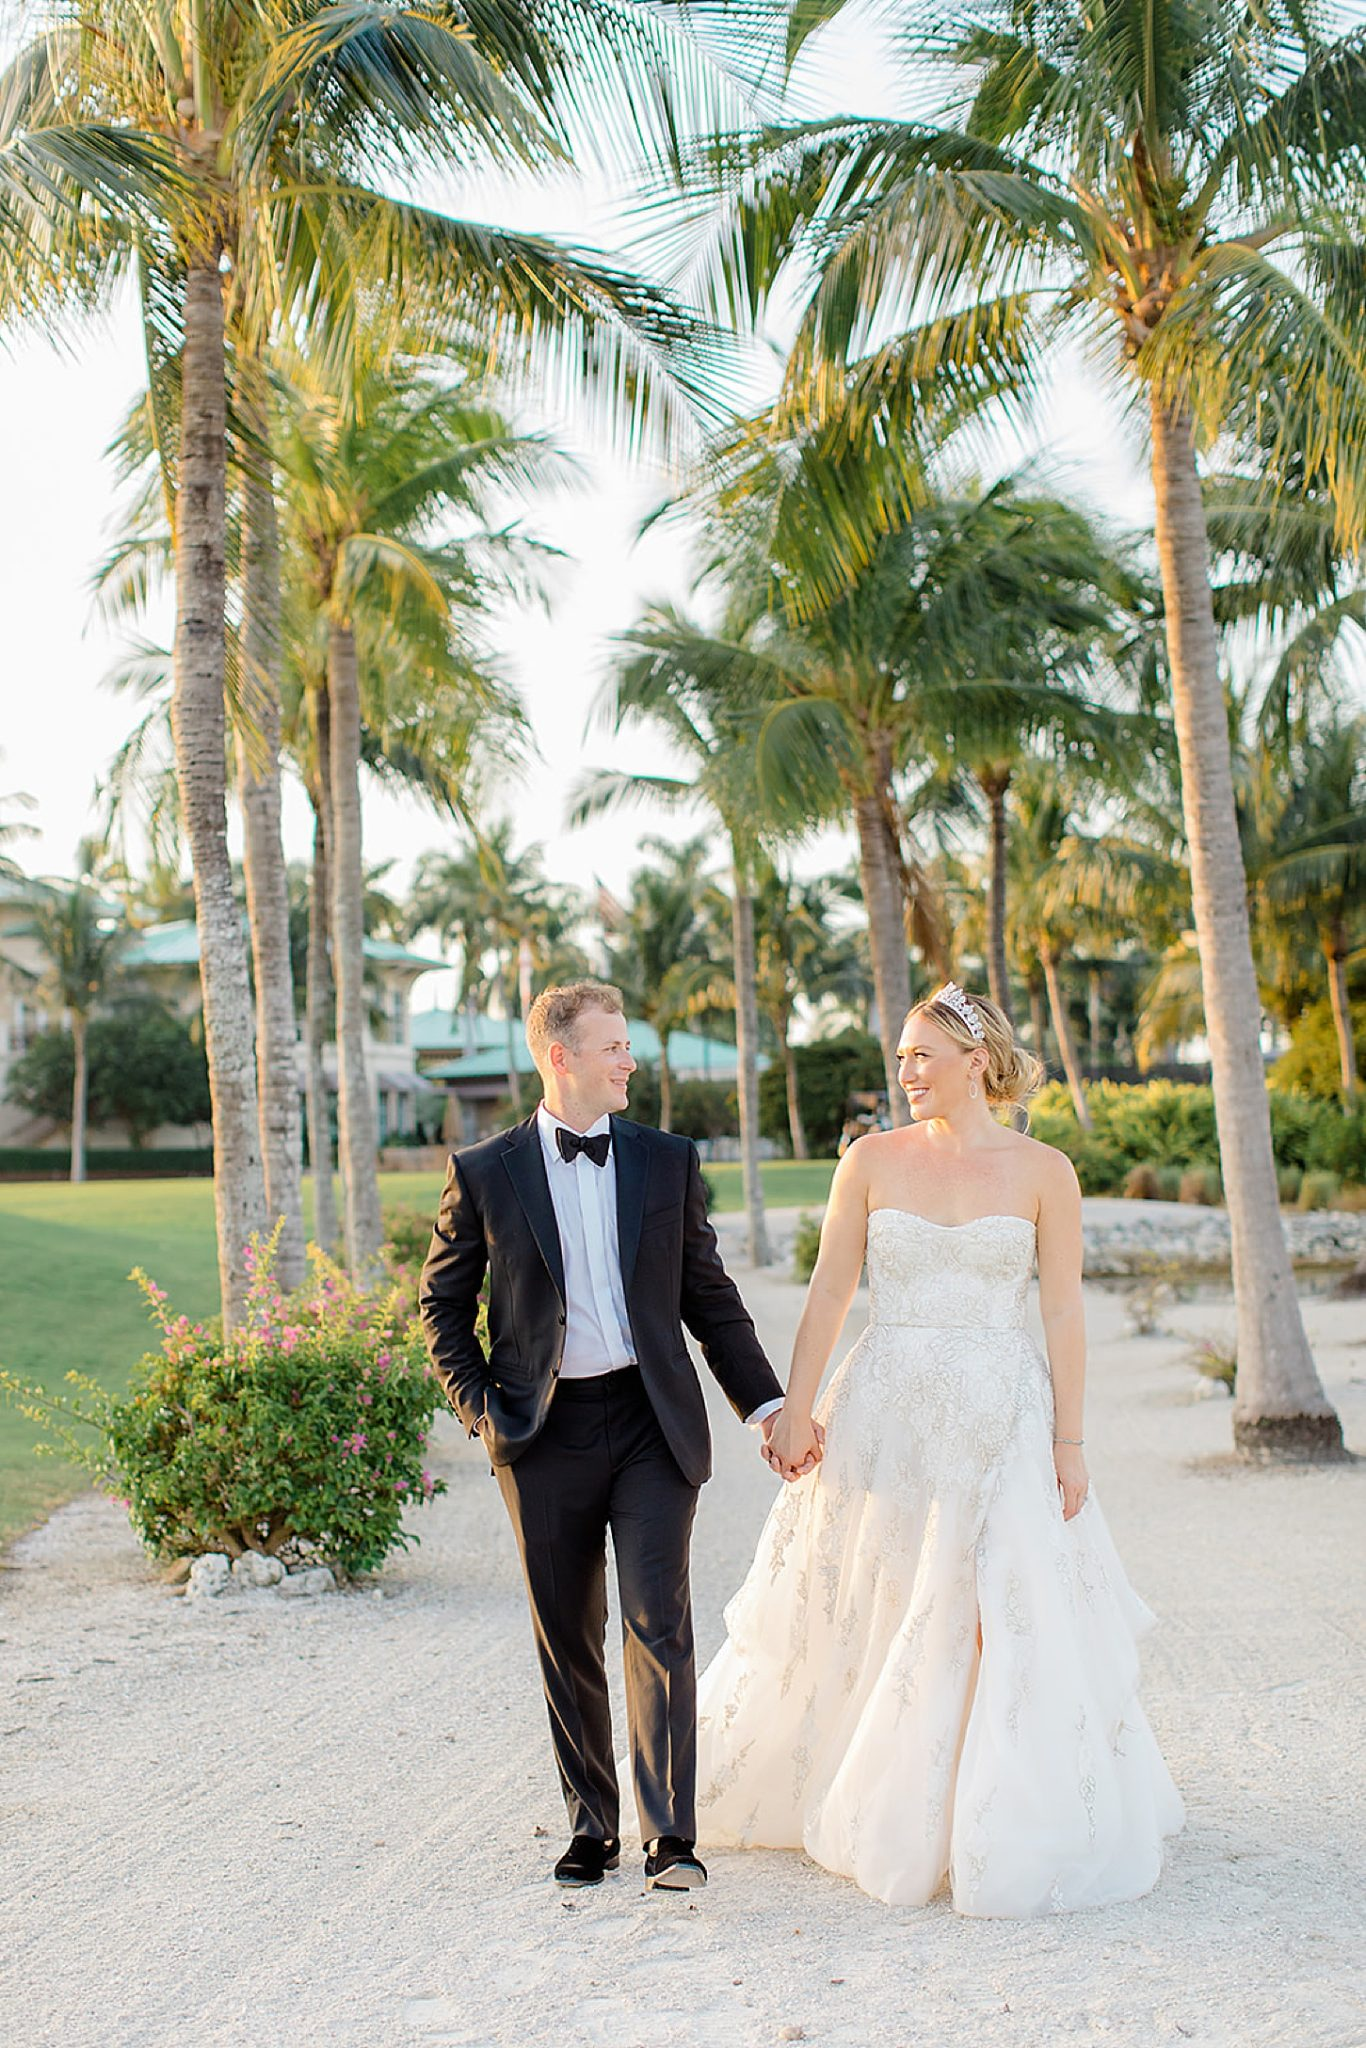 Marco Island Florida Wedding Photography by Magdalena Studios 0026 scaled